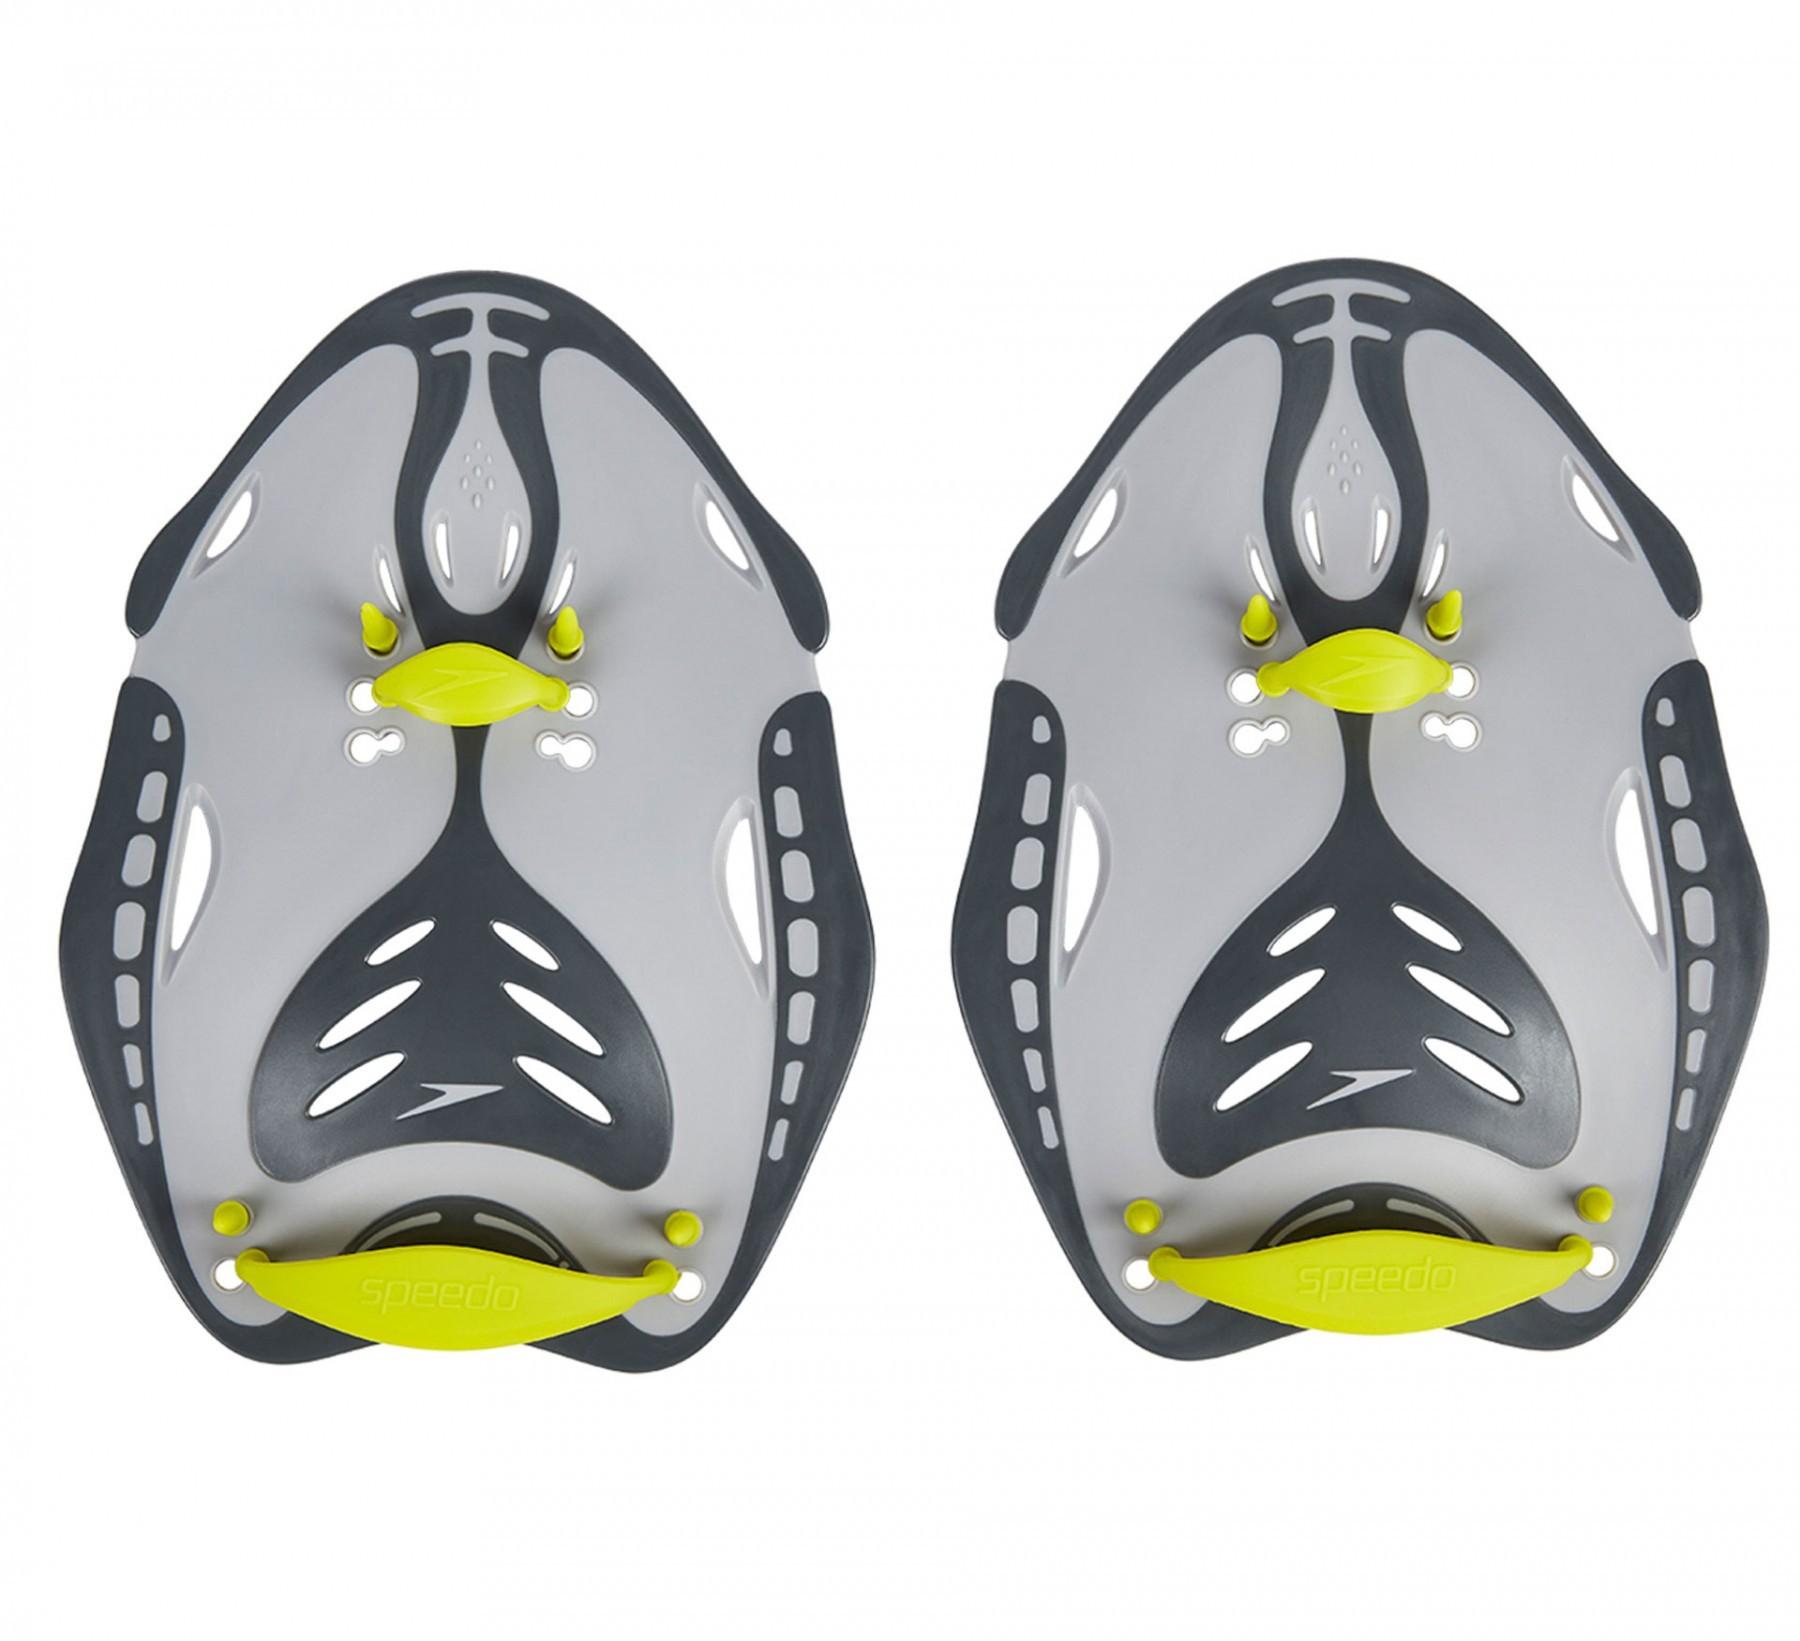 Speedo Power Paddle grey/green